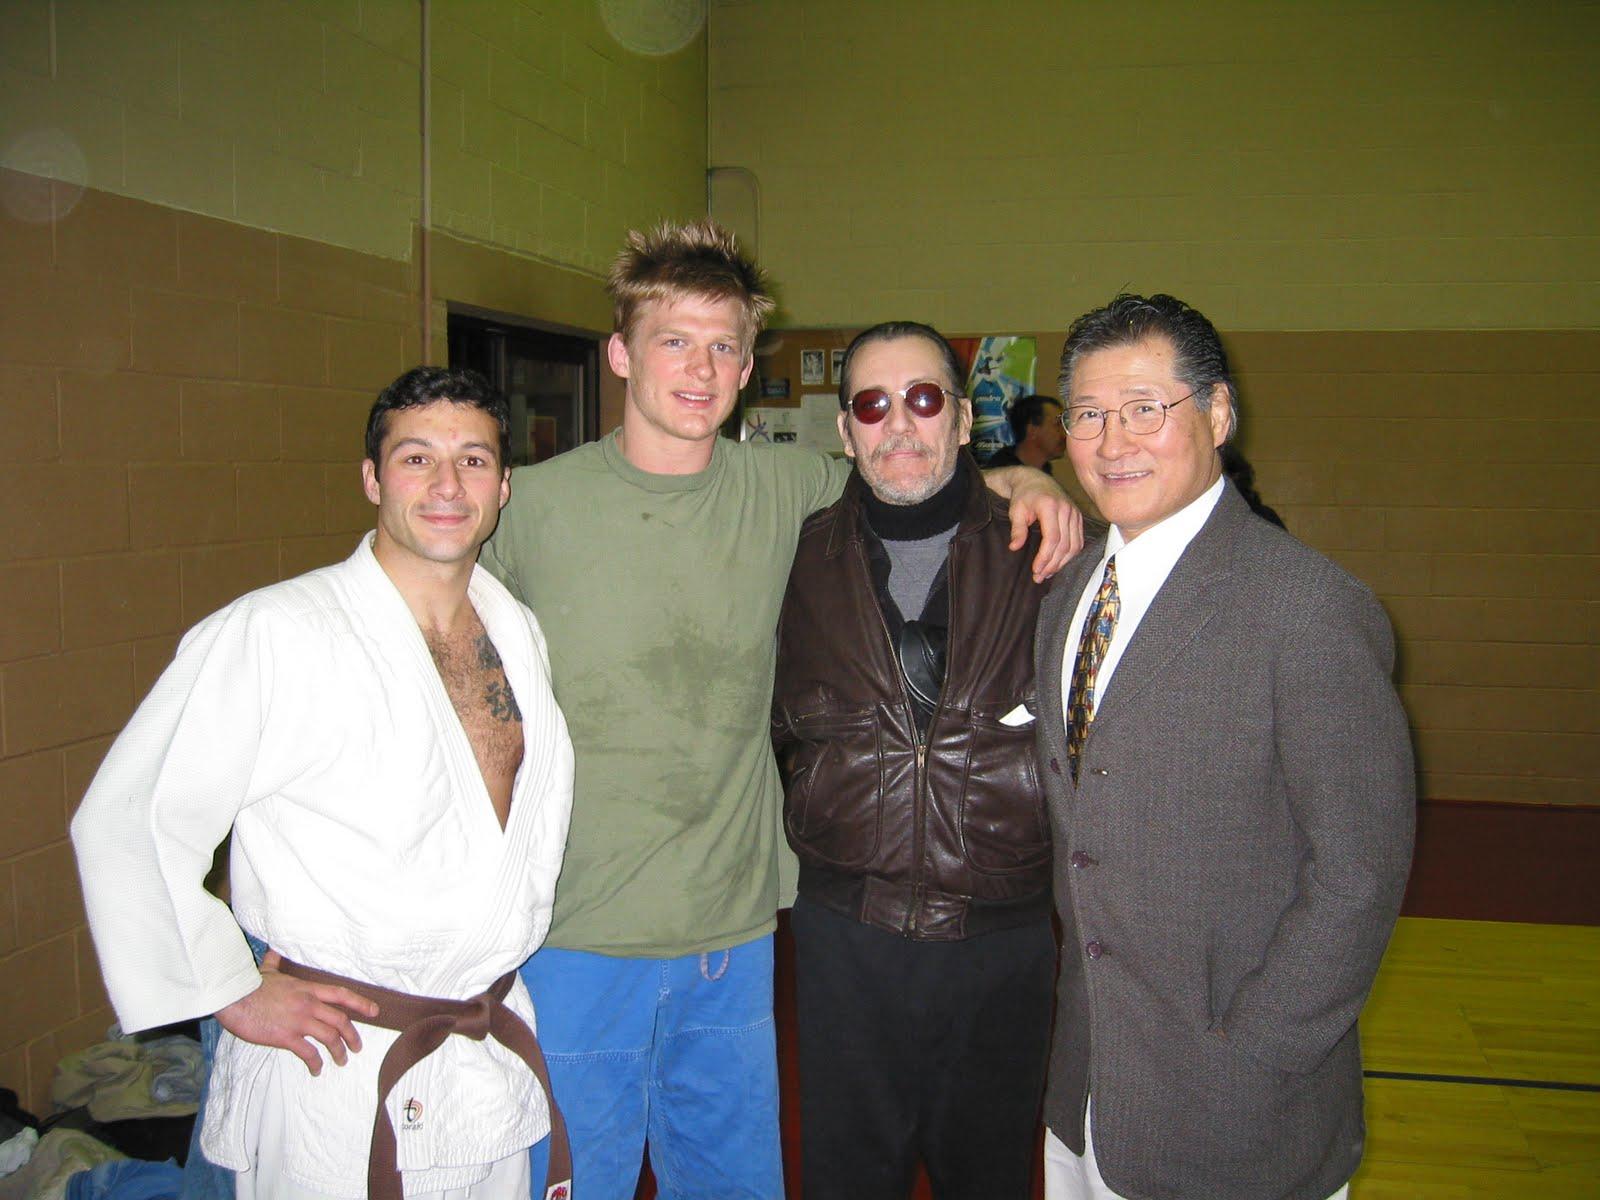 Damian Ross, David Ellis, Carl Cestari and Yoshisada Yonezuka at Damian's Judo Black Belt promotion.